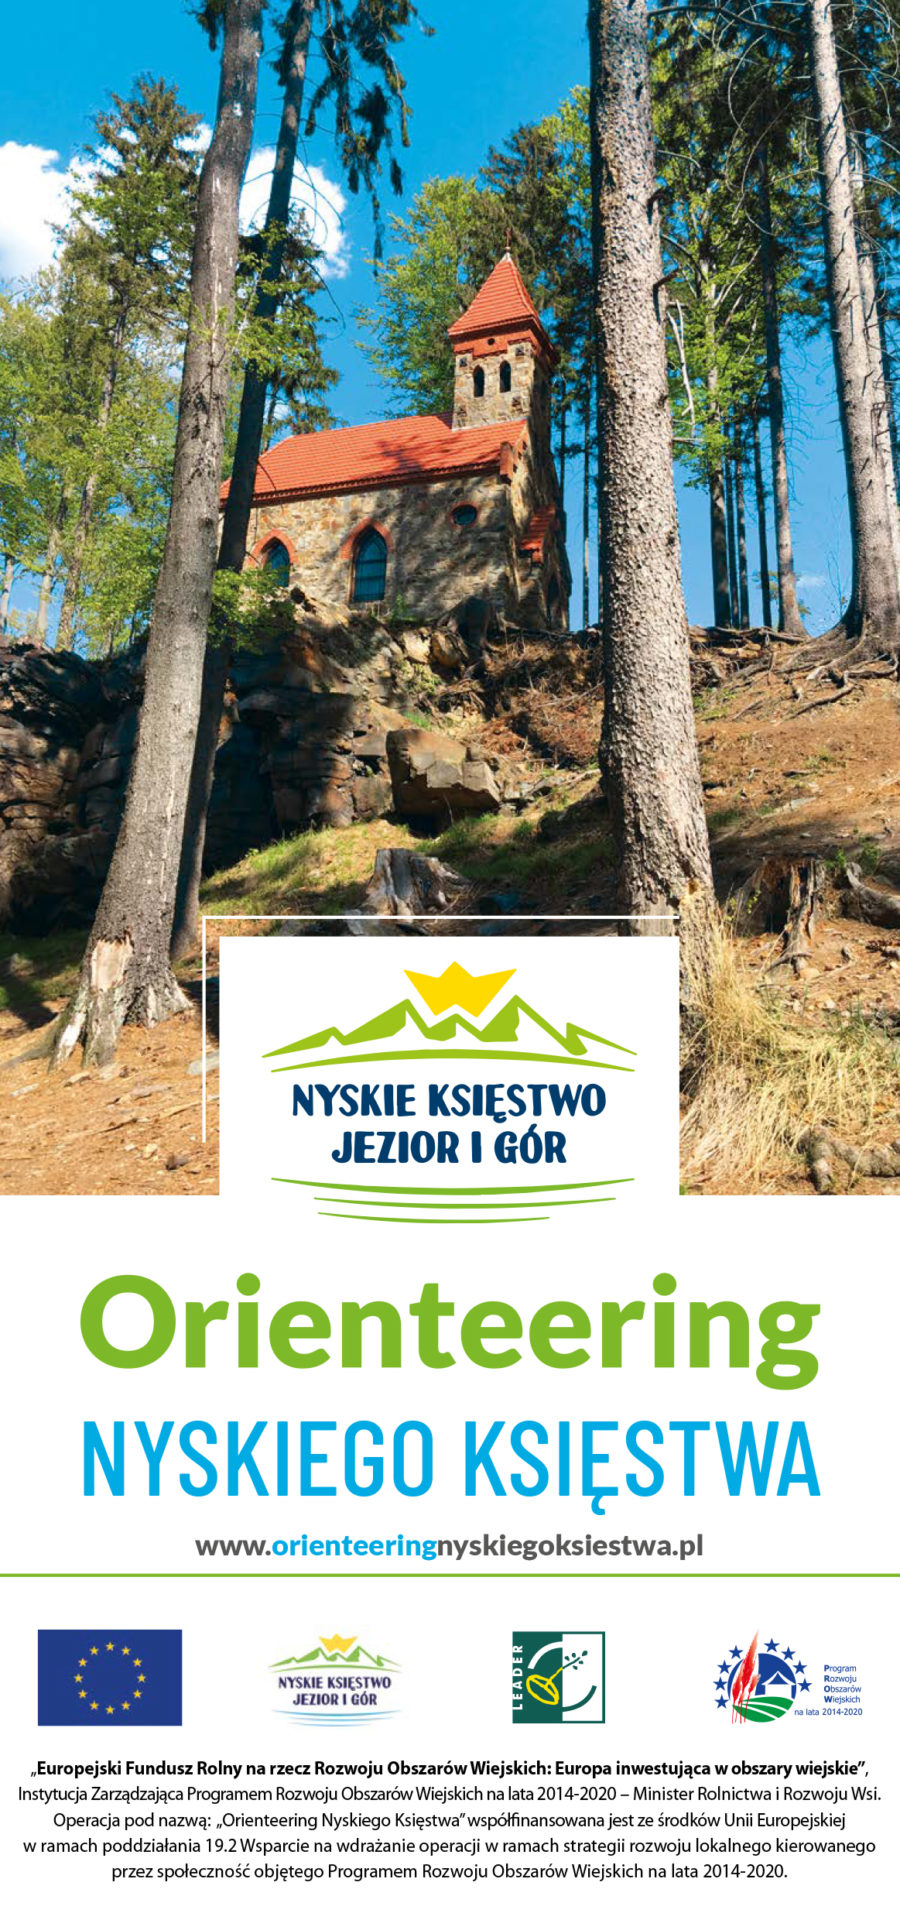 Orienteering Nyskiego Ksistwa - Gmina Nysa